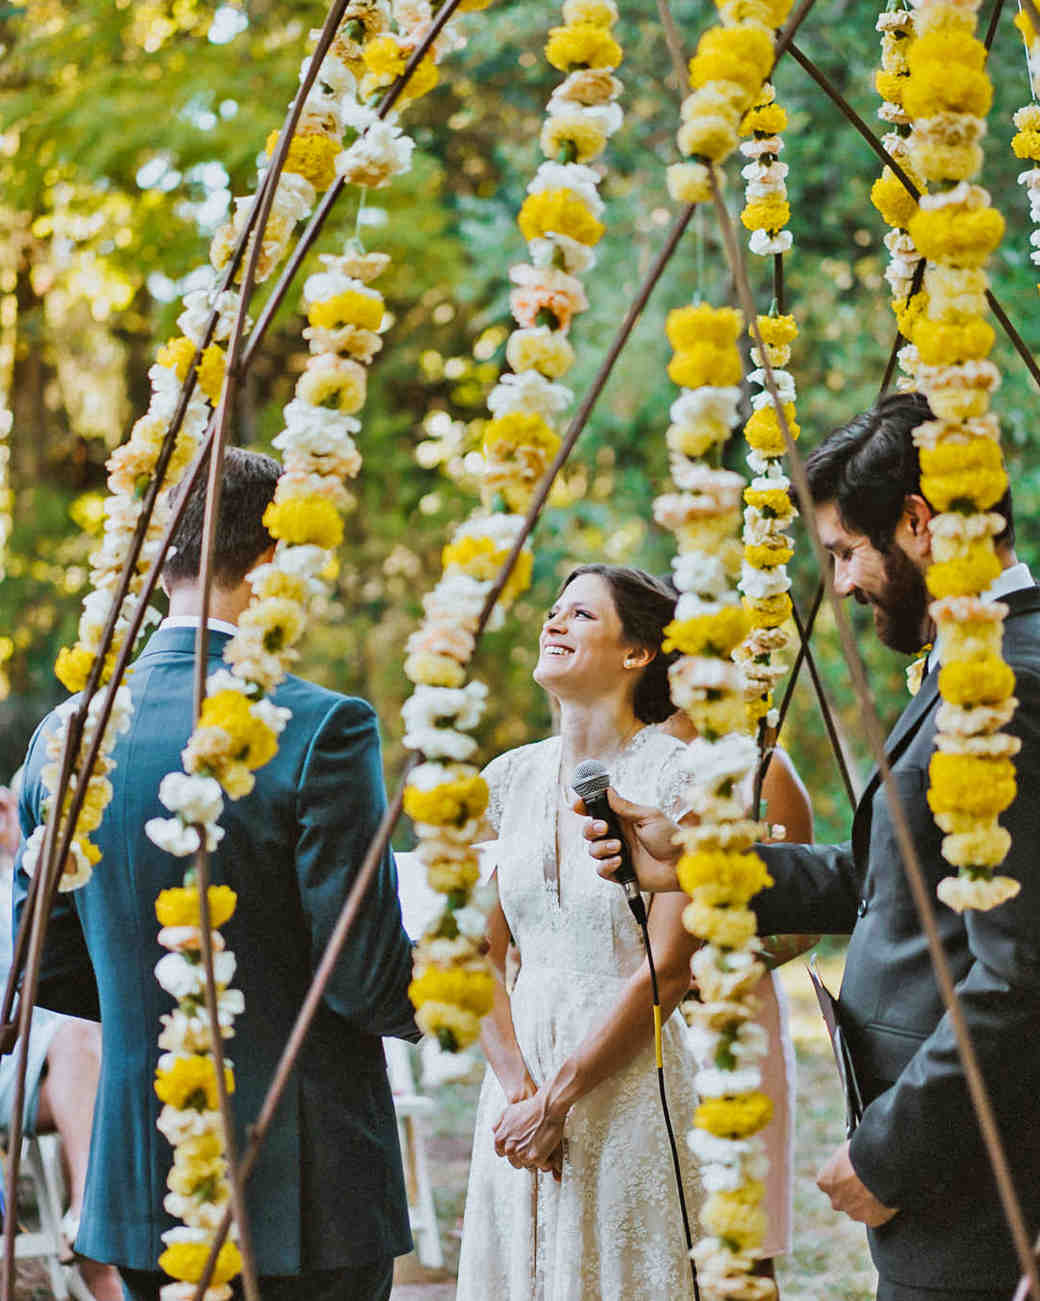 amy nick wedding ceremony yellow flowers